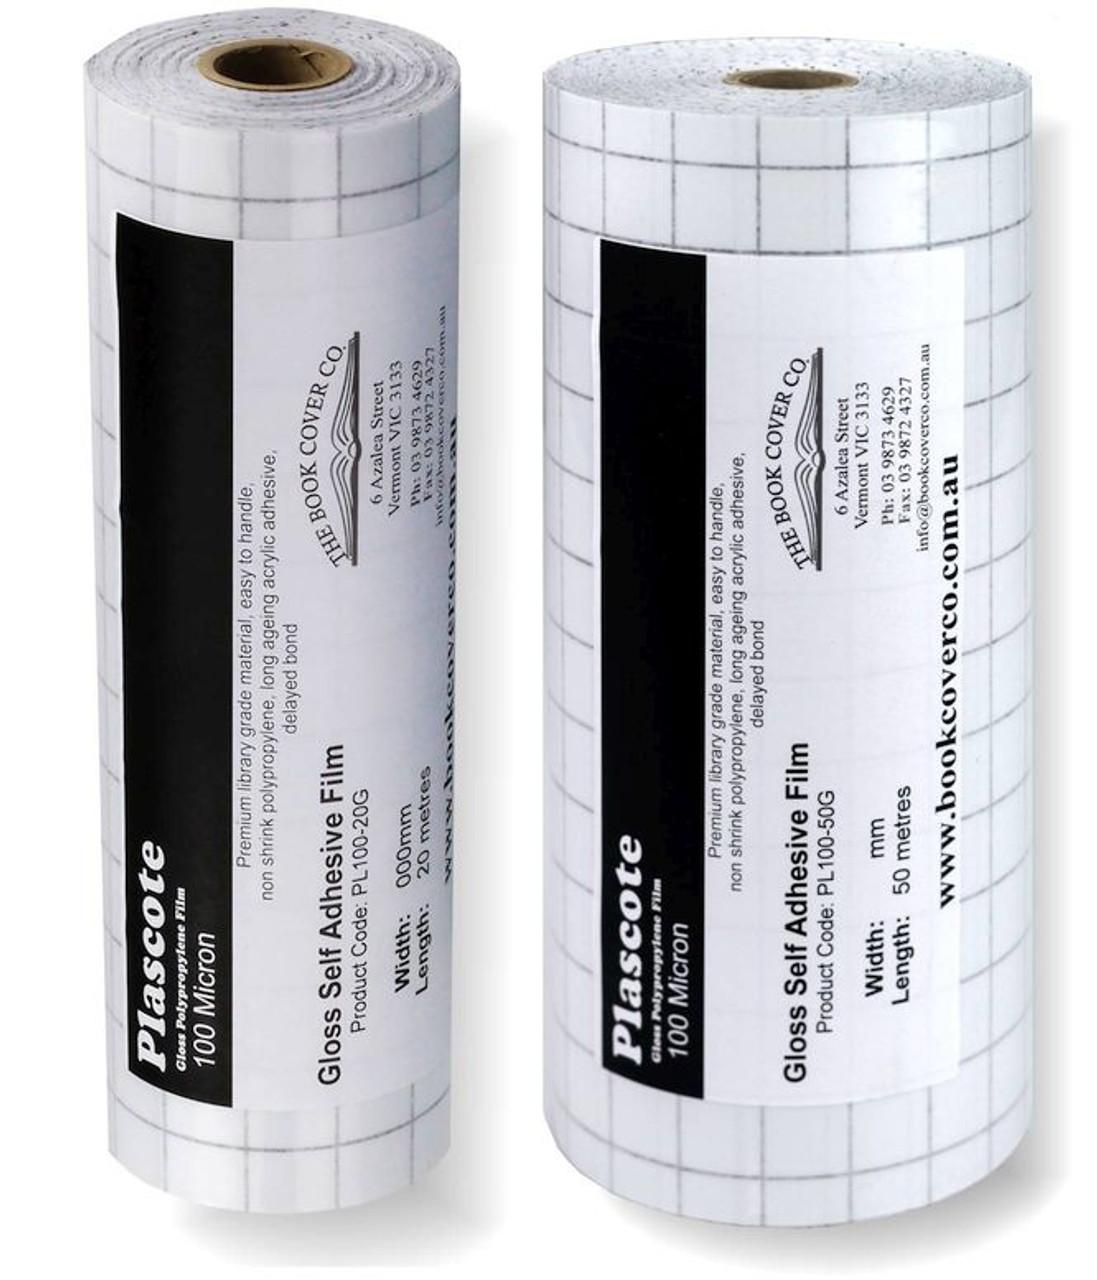 Plascote 100 rolls - 20 and 50 M rolls